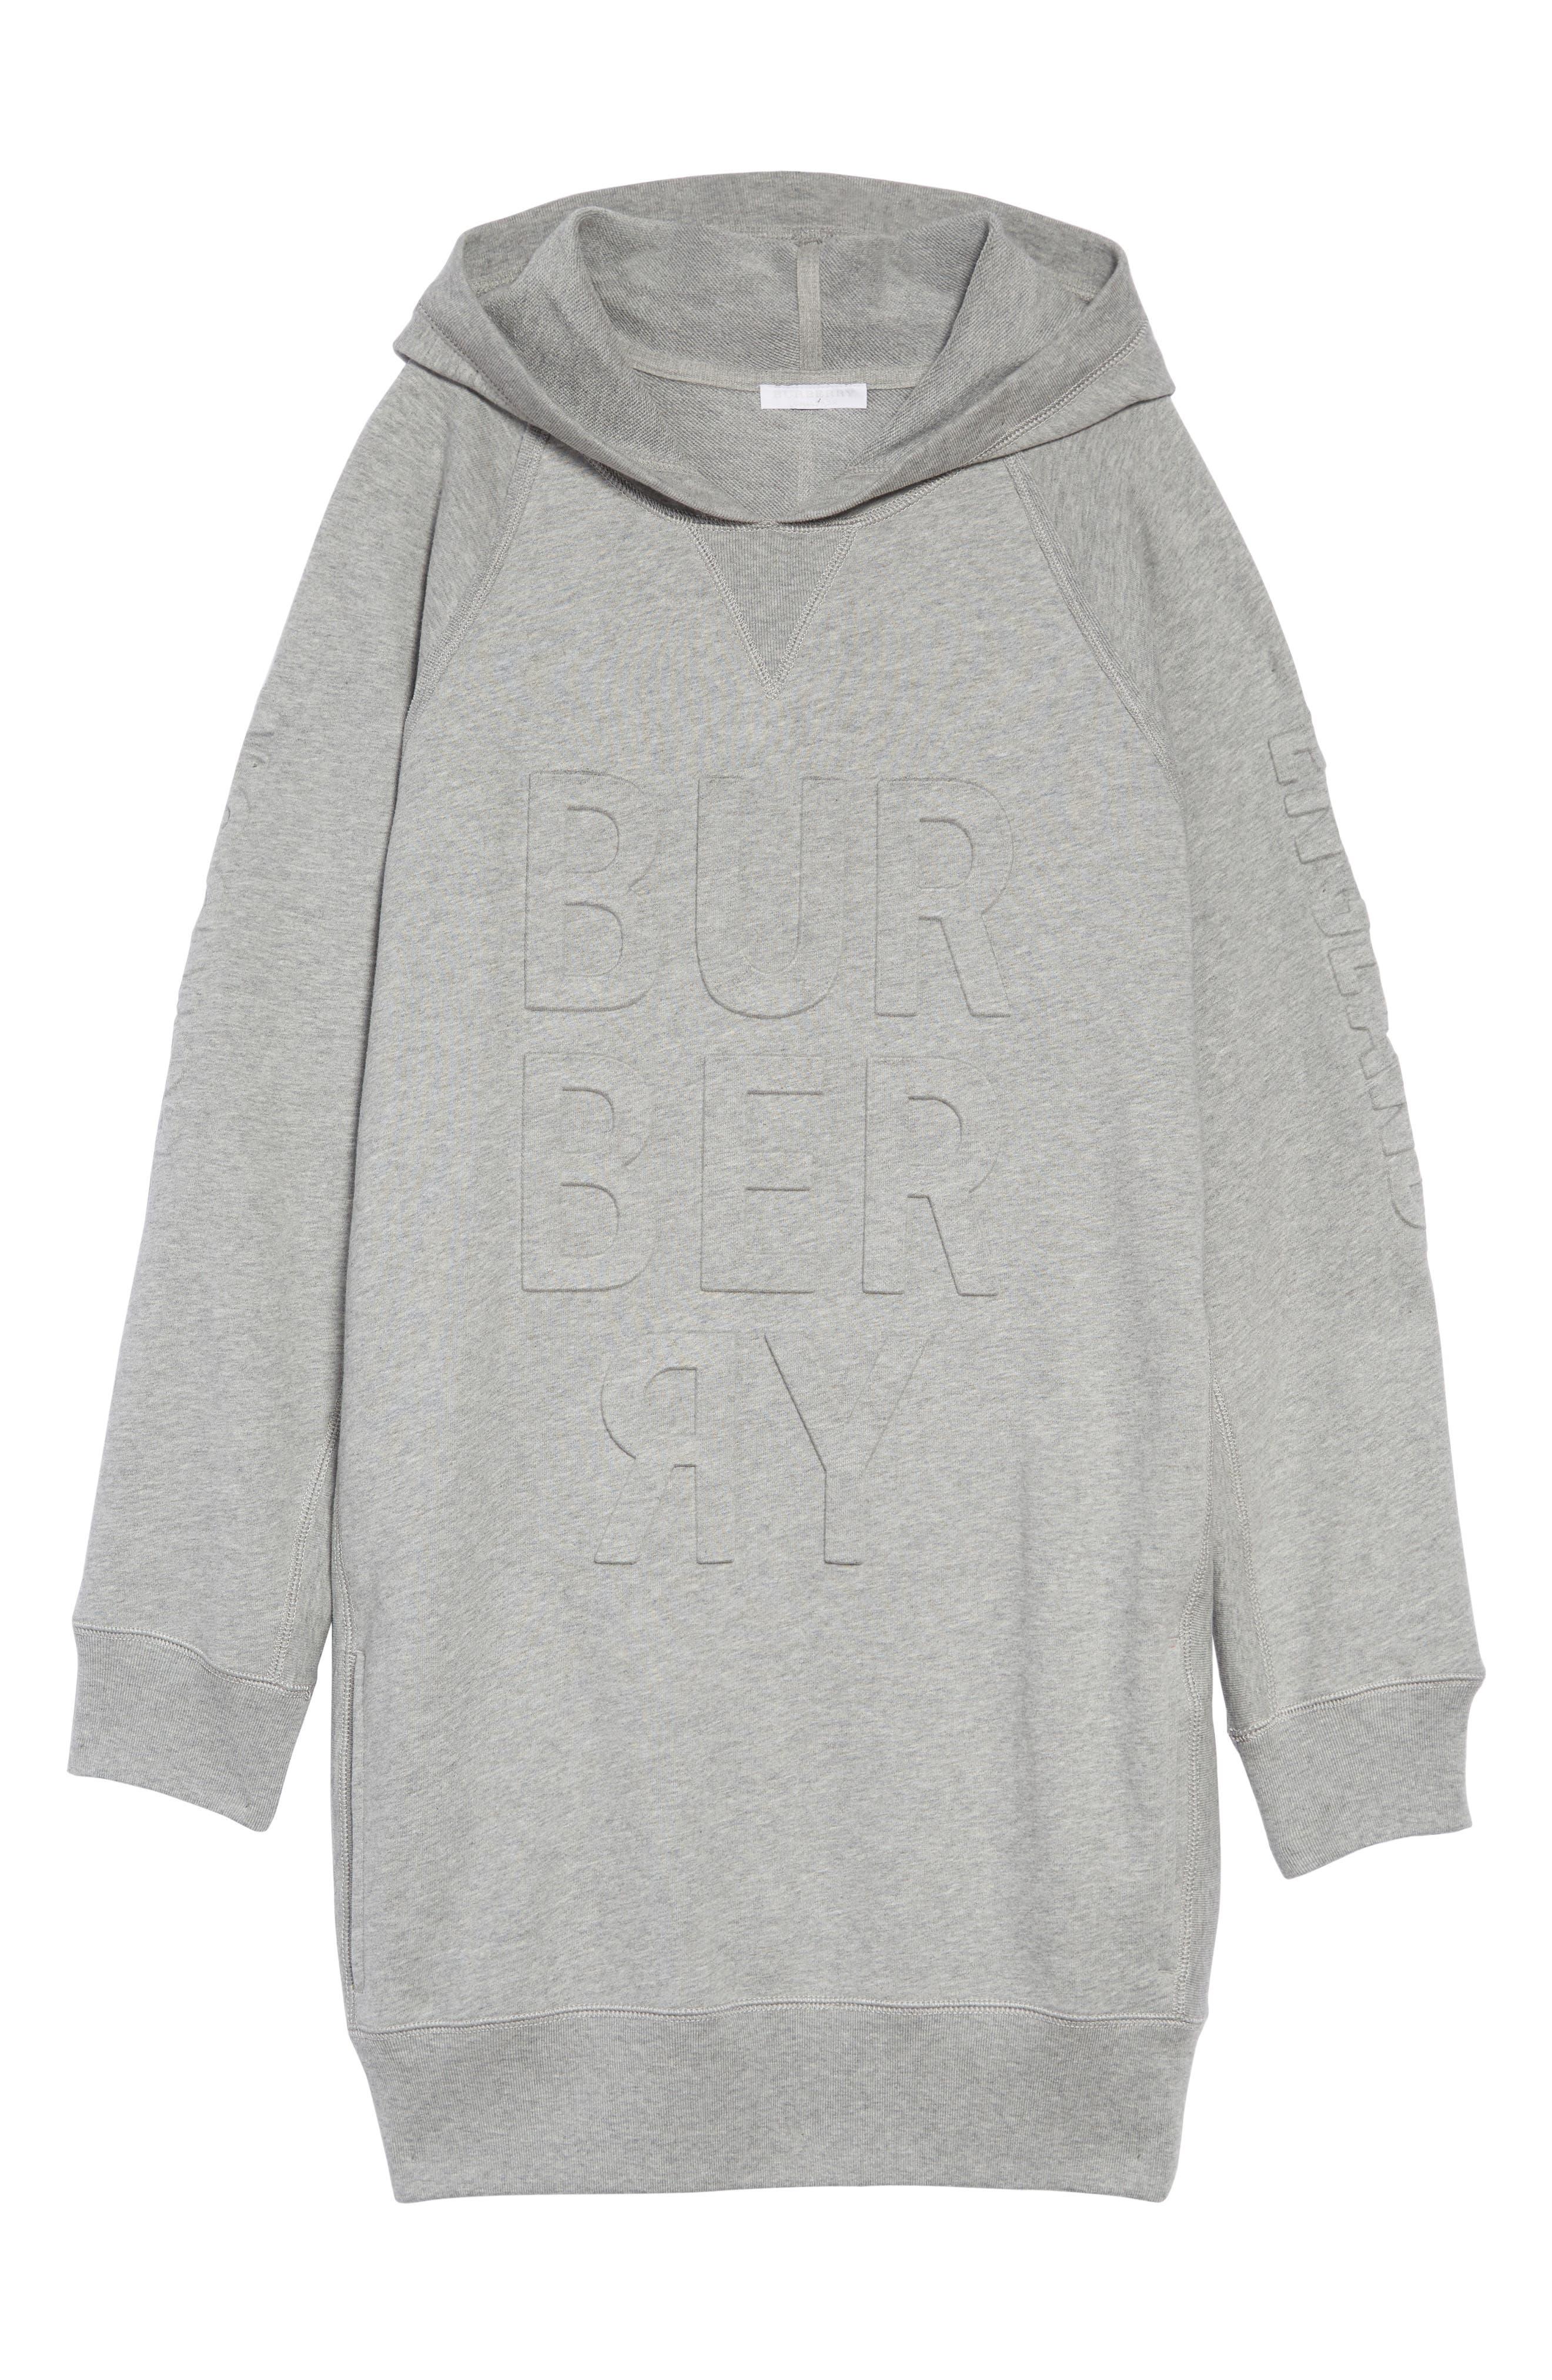 BURBERRY Aurora Logo Sweatshirt Dress, Main, color, GREY MELANGE